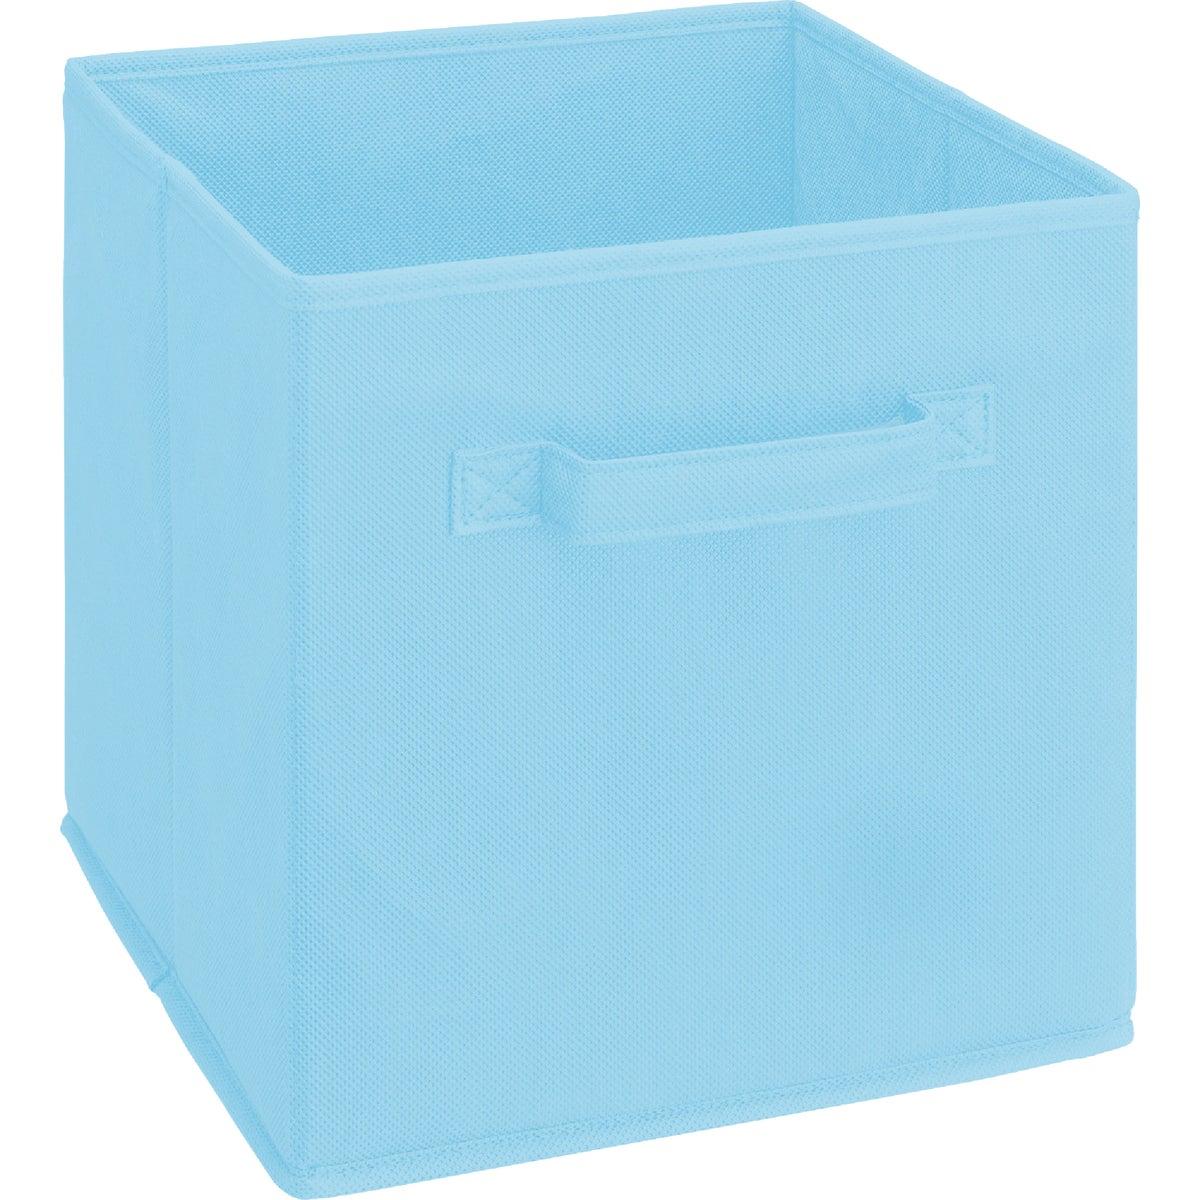 LT BLUE FABRIC DRAWER